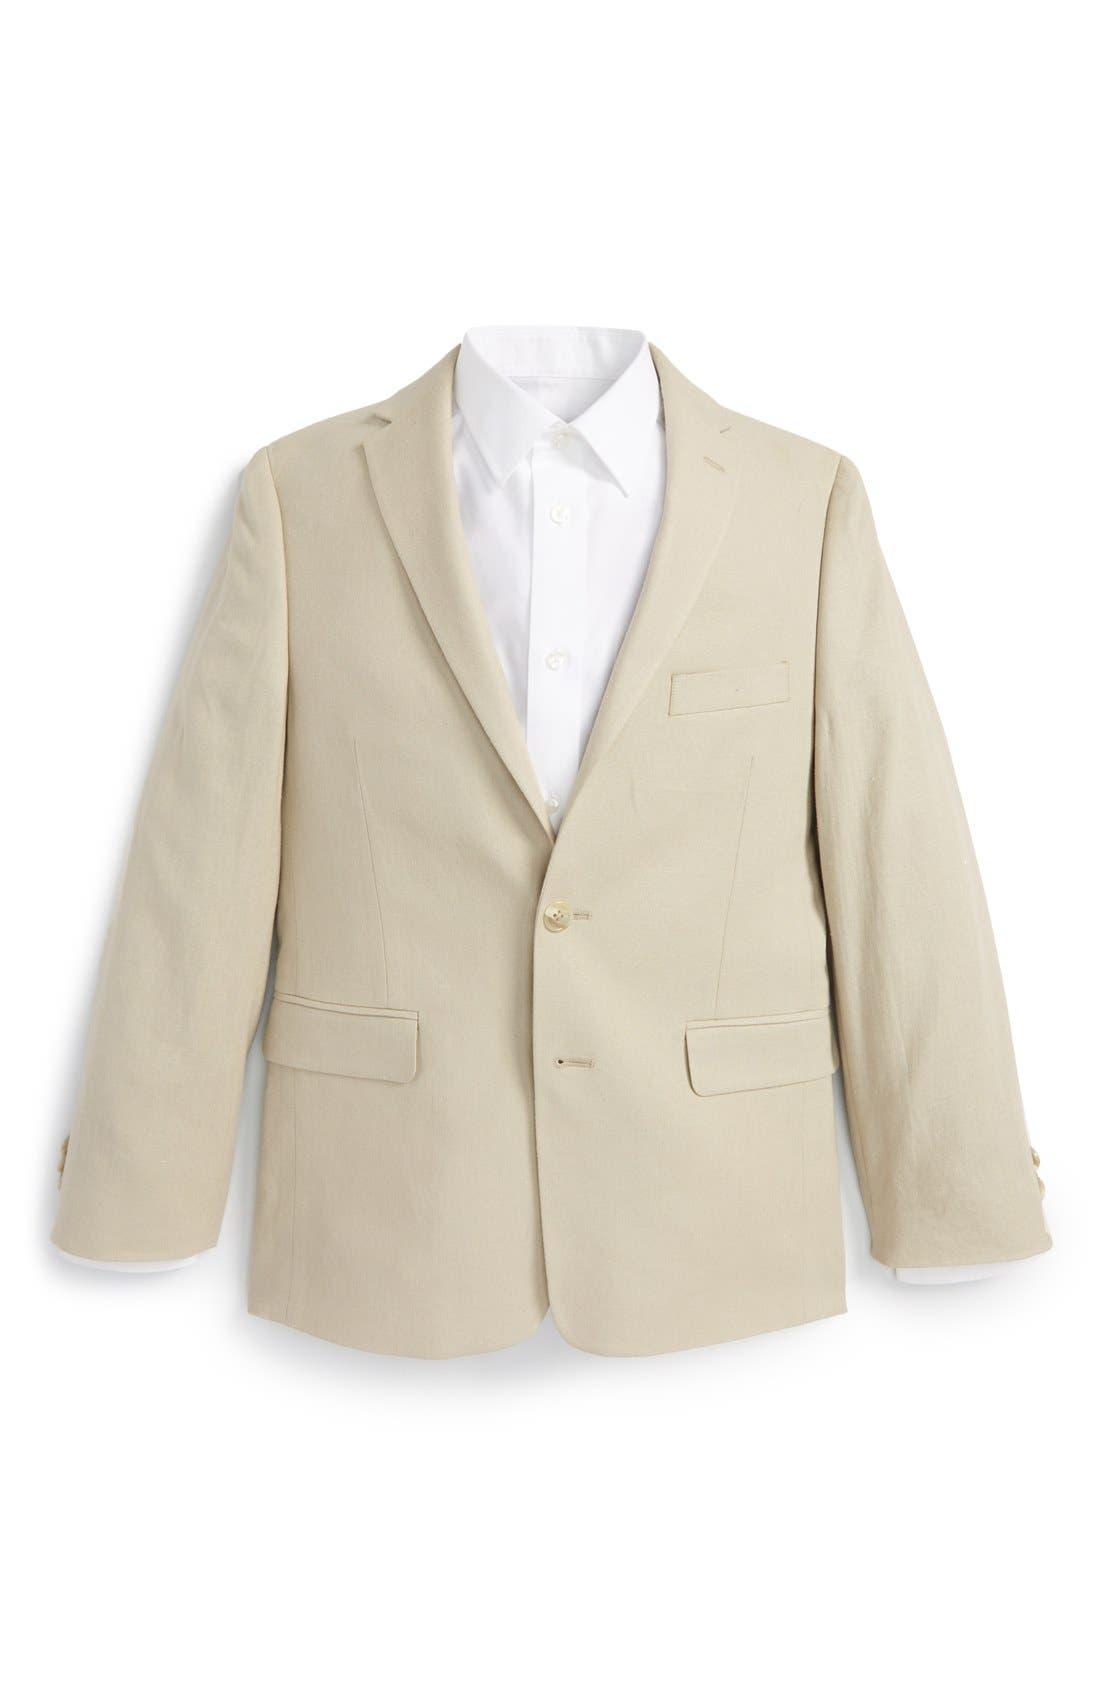 MICHAEL KORS Linen Blend Blazer, Main, color, TAN